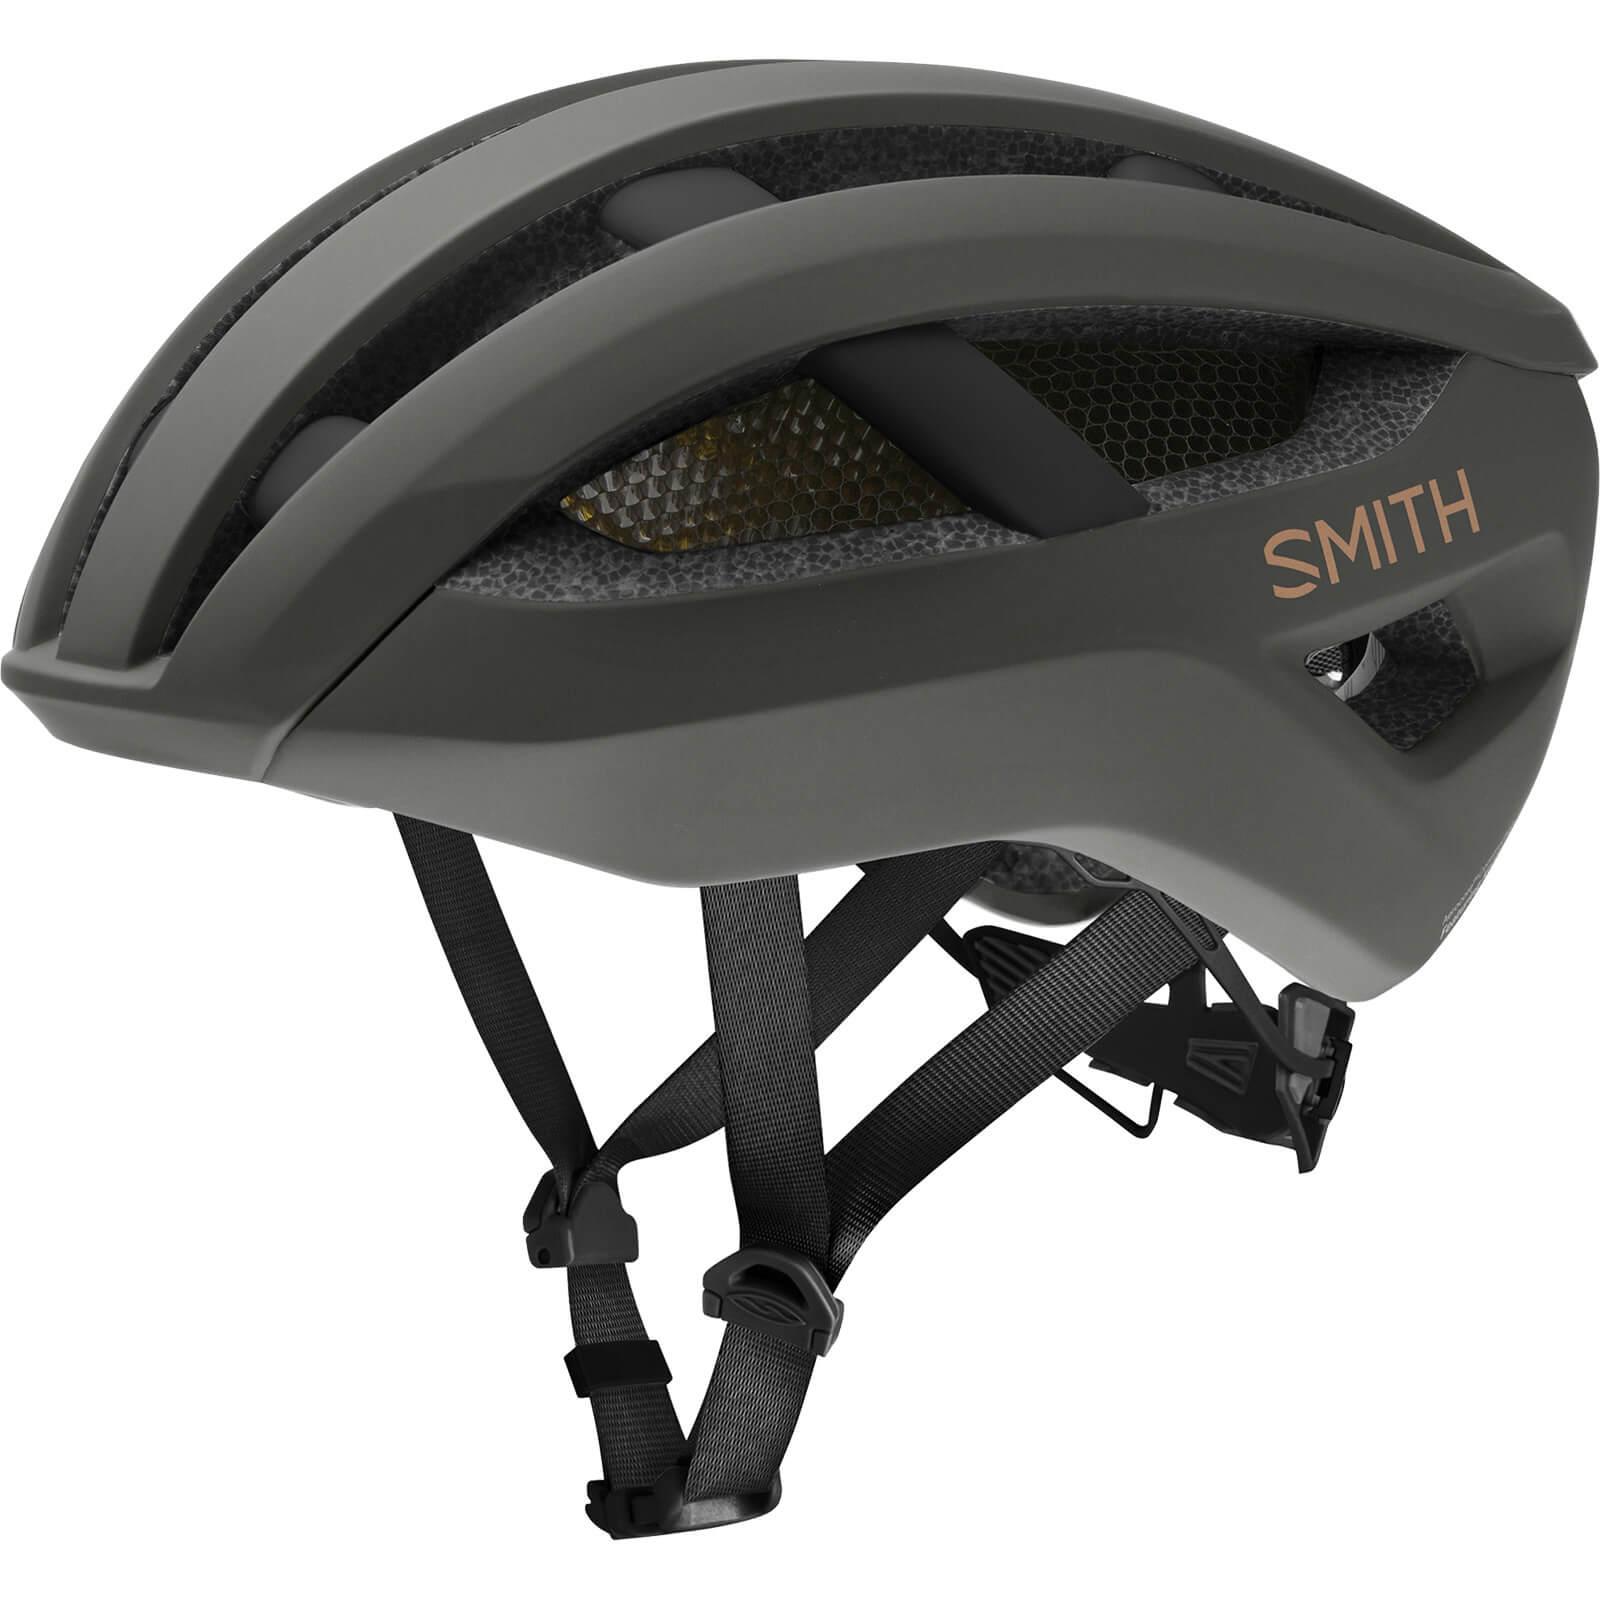 Smith Network MIPS Road Helmet - Large - Brown; unisex